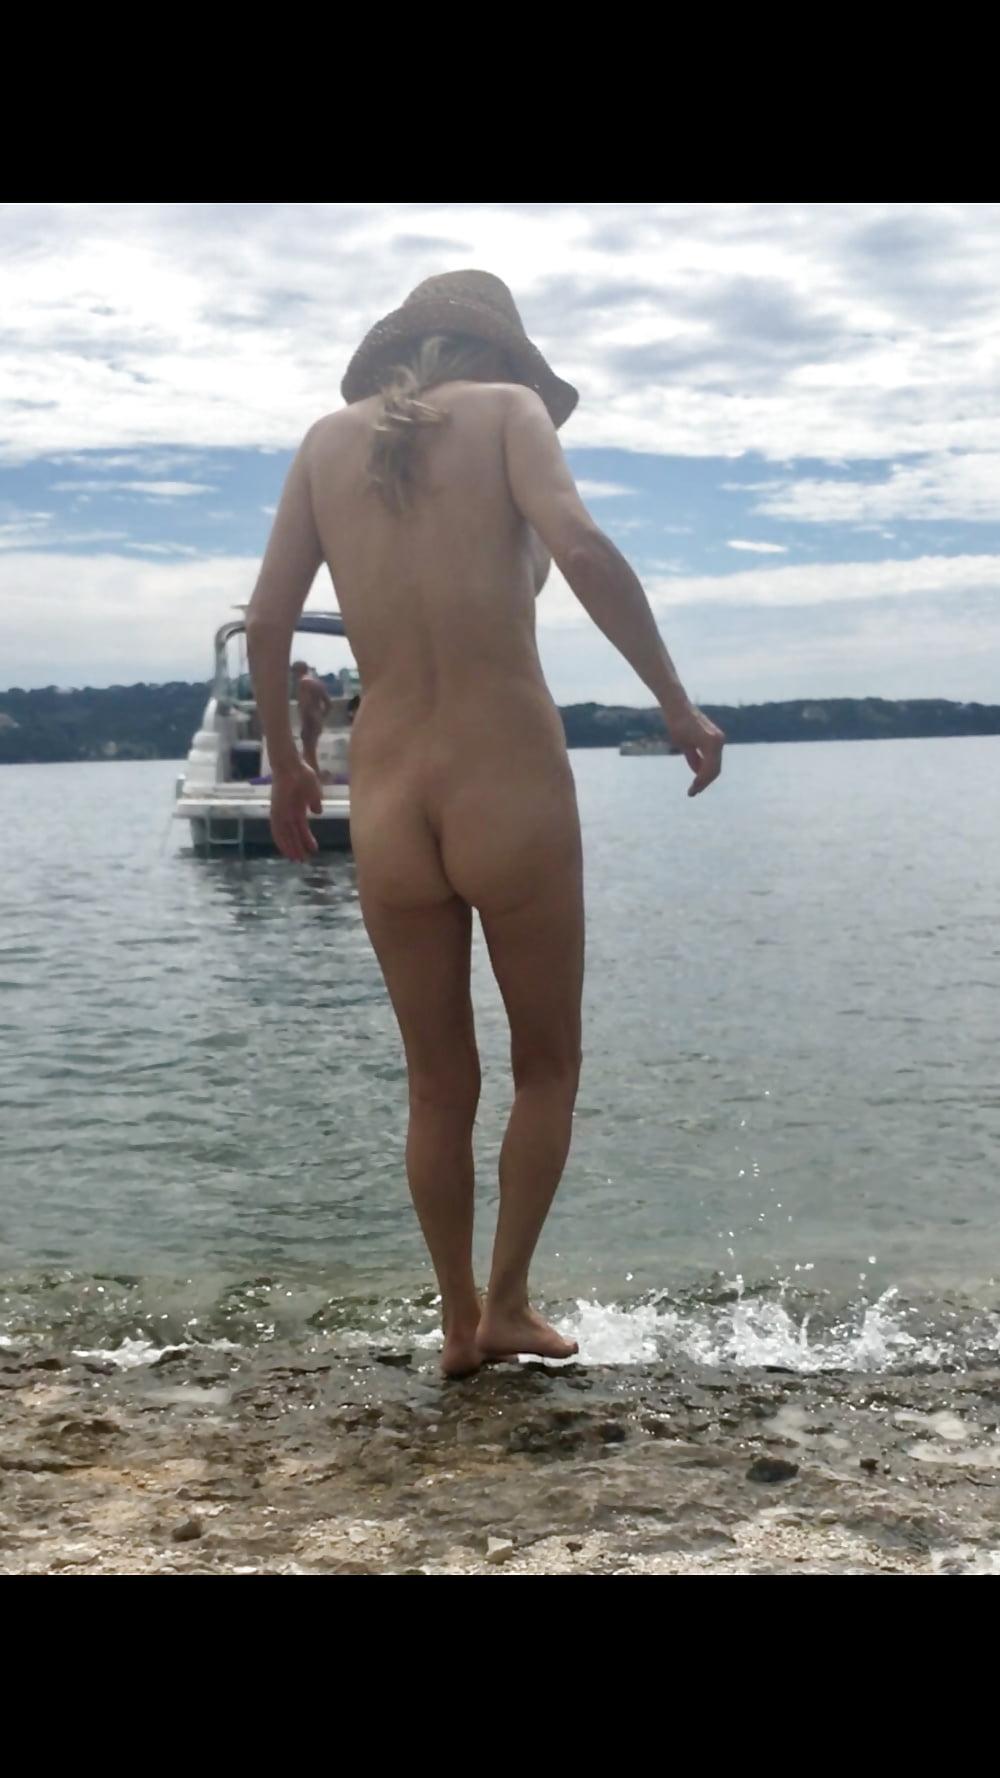 Meg Ryan Vacation Nude - 5 Pics - Xhamstercom-1505